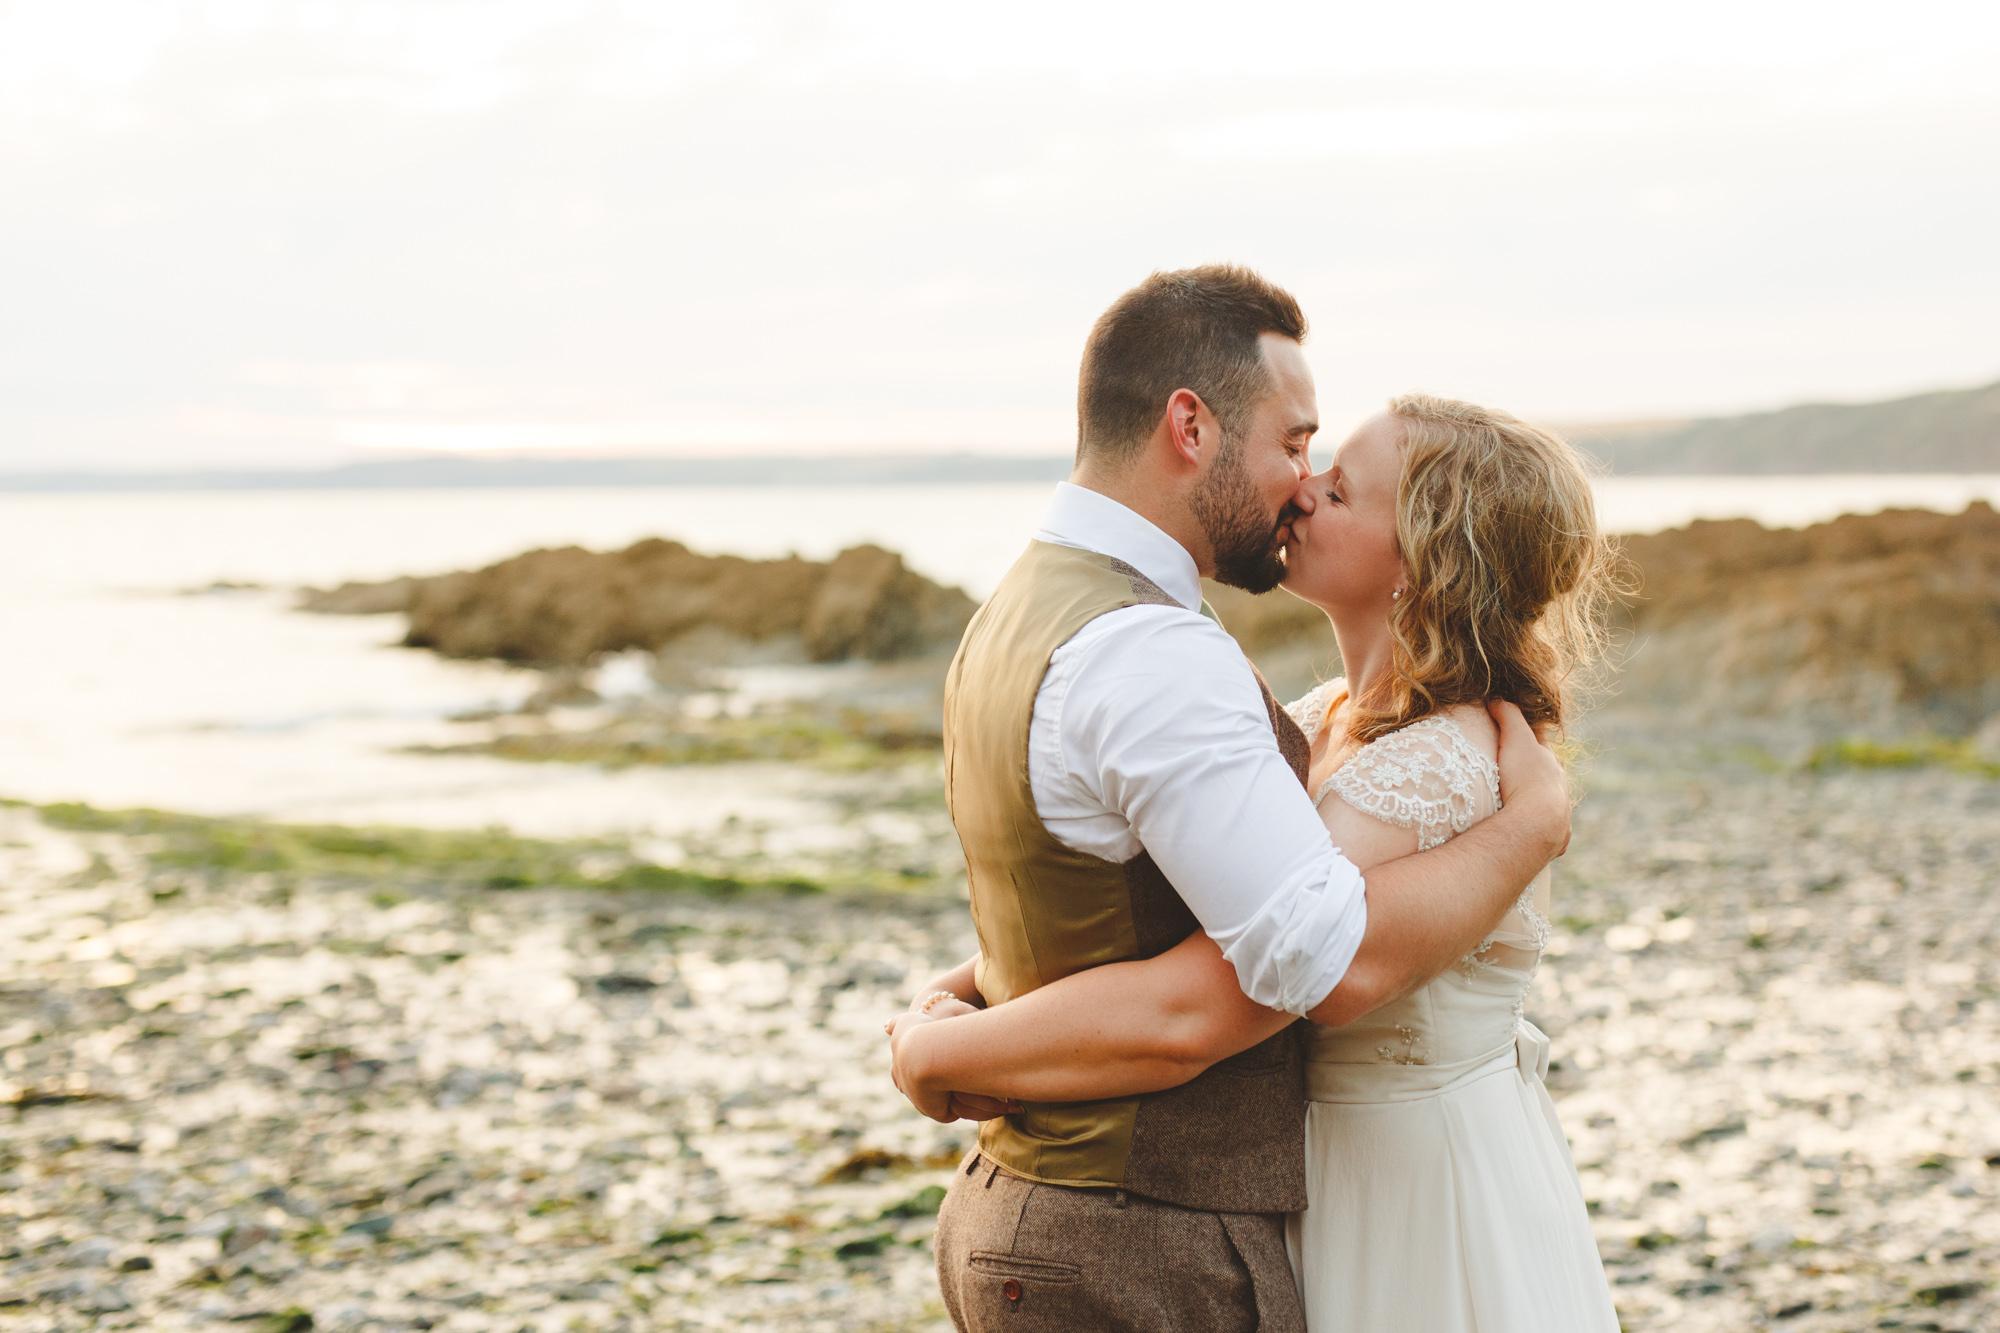 cornwall-alternative-wedding-photographer-beach-wedding-16.jpg